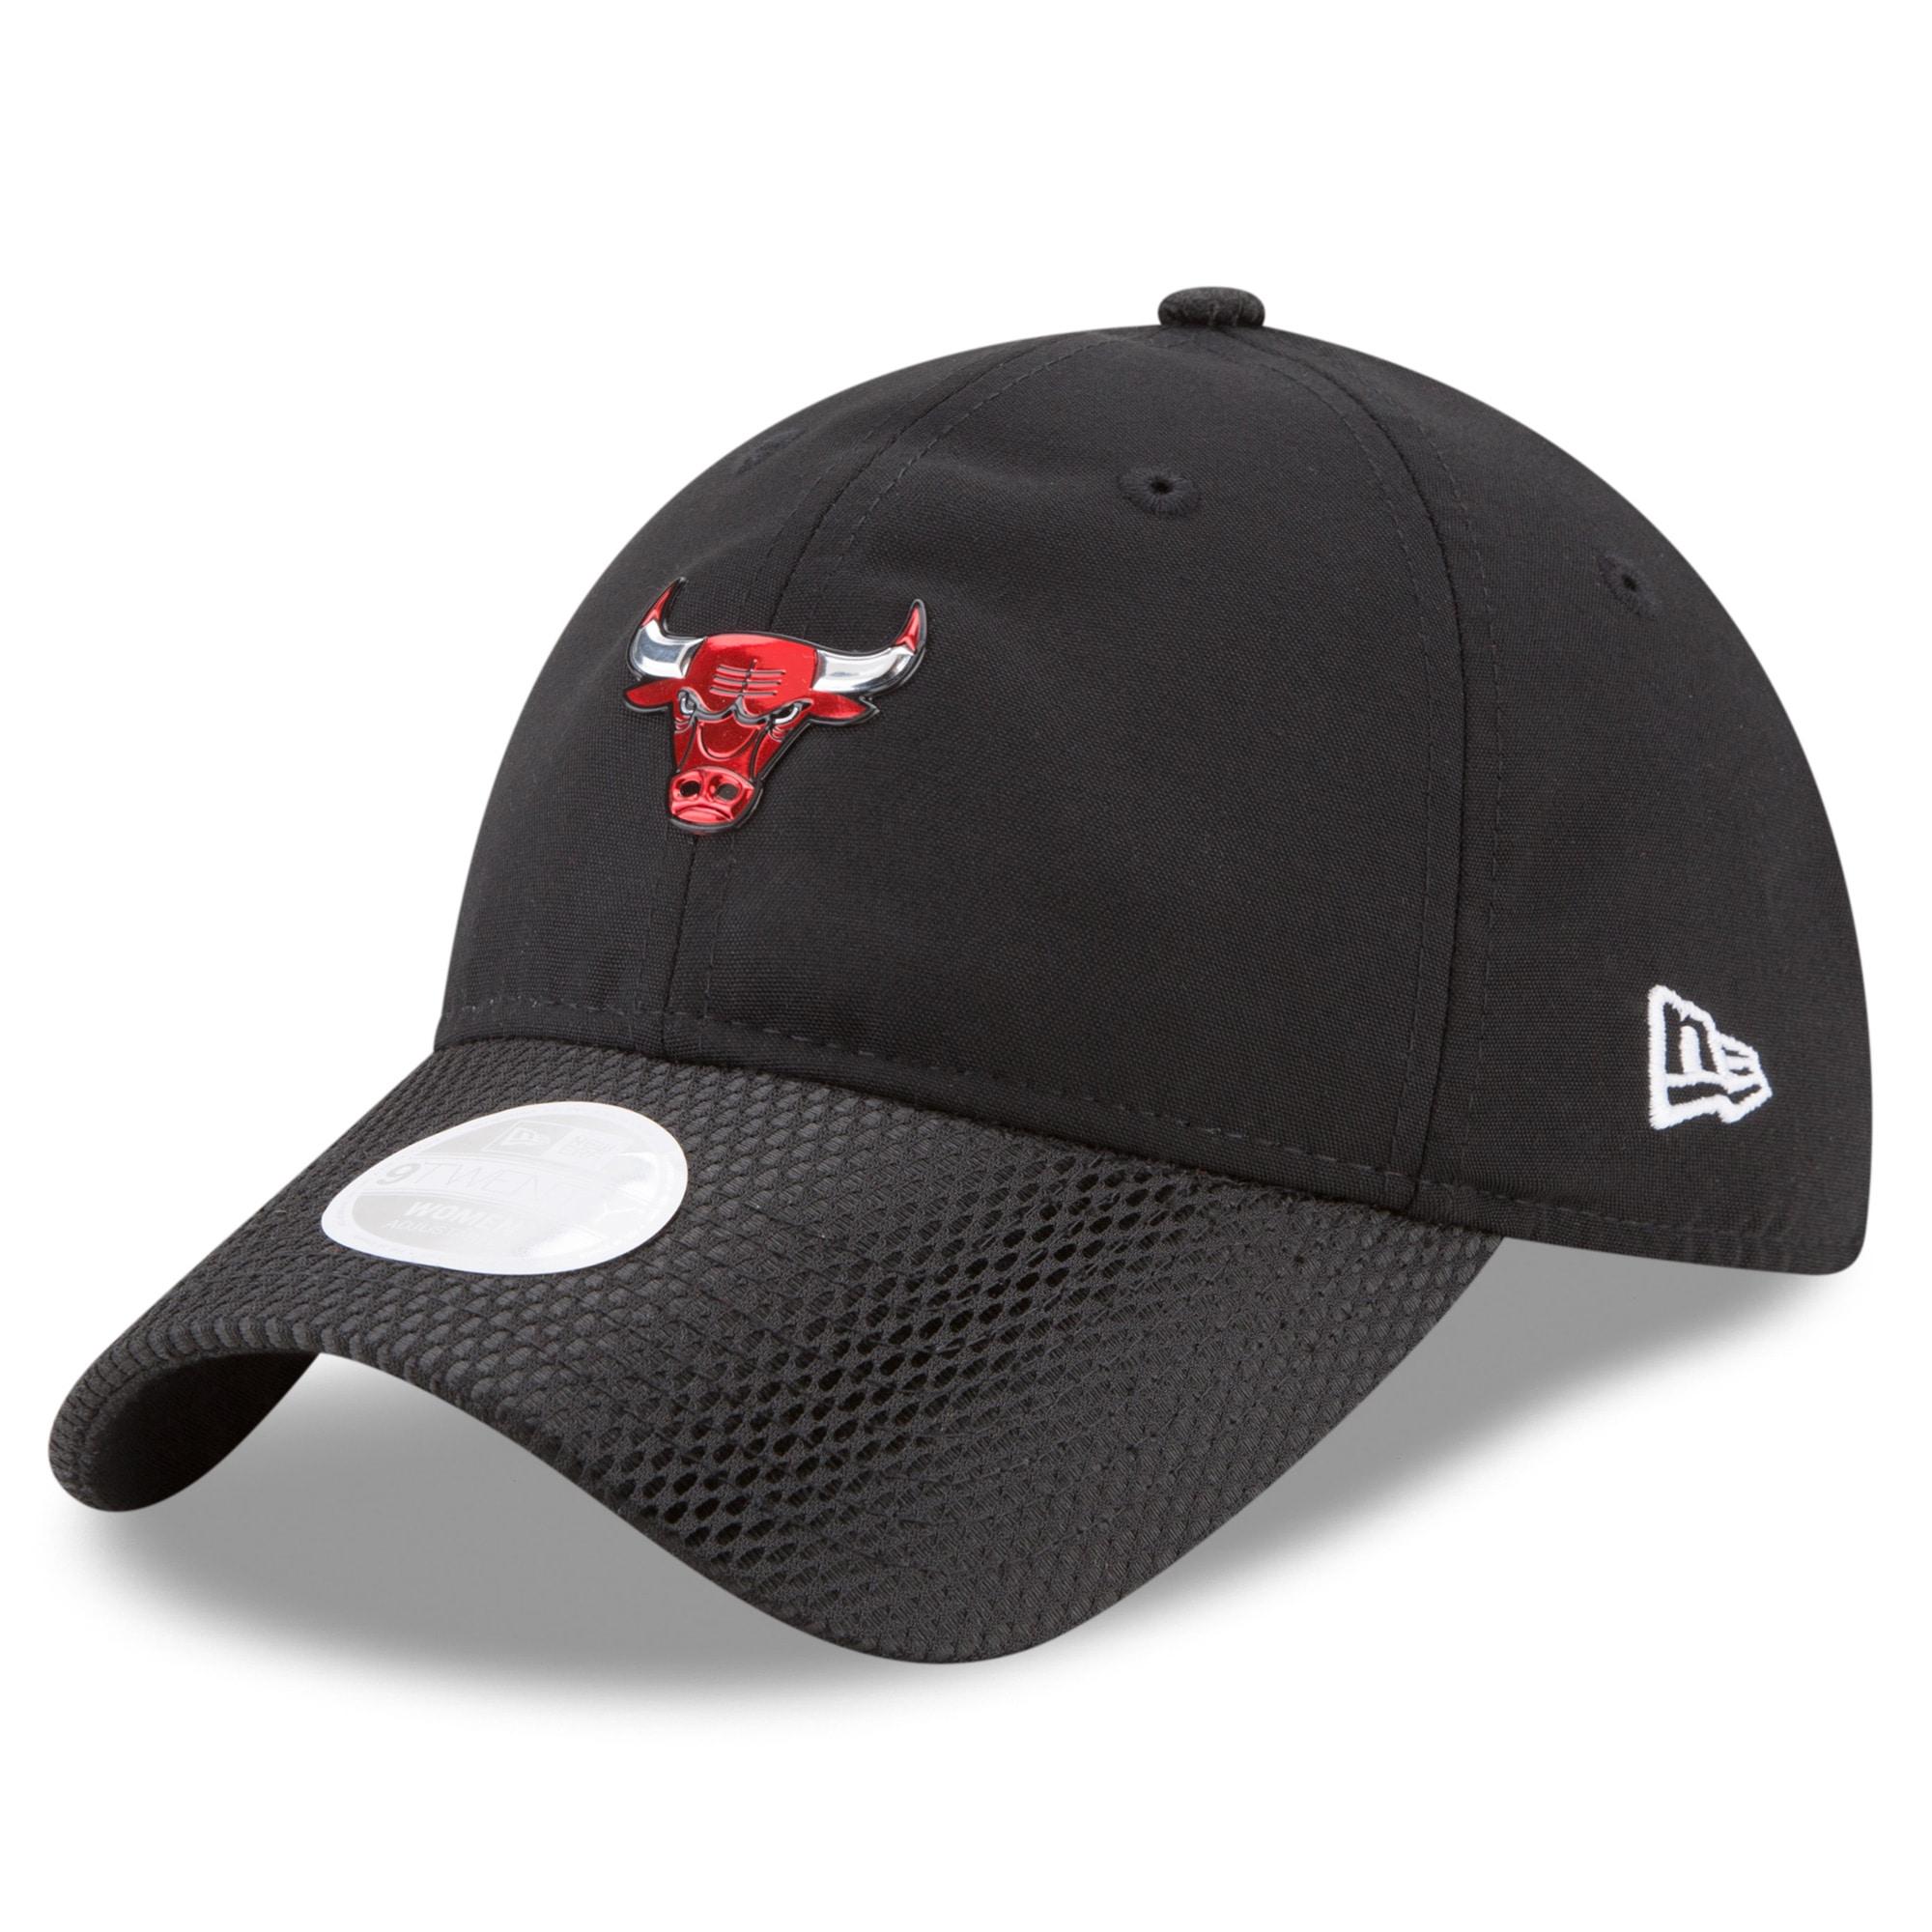 Chicago Bulls New Era Women's On-Court 9TWENTY Adjustable Hat - Black